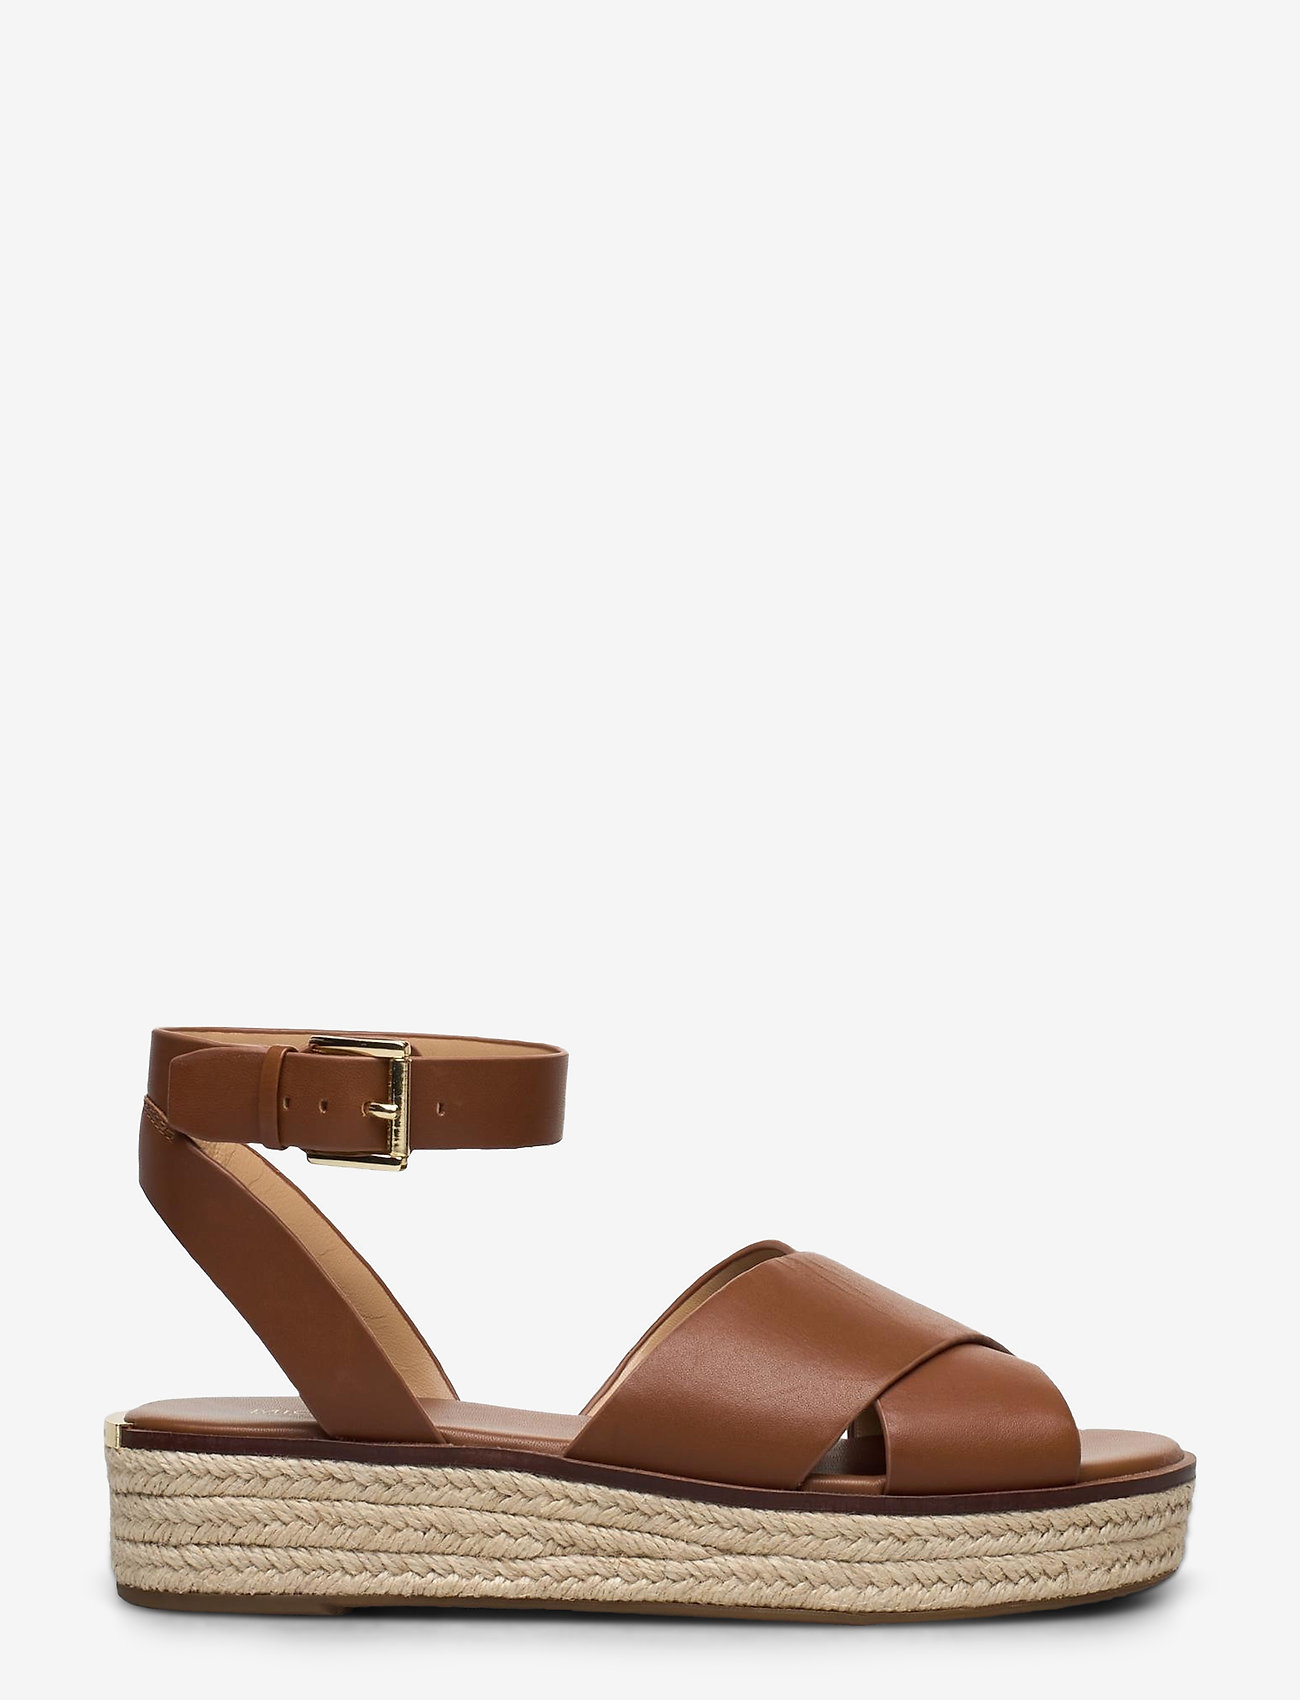 Michael Kors Shoes - ABBOTT SANDAL - lage espadrilles - luggage - 1